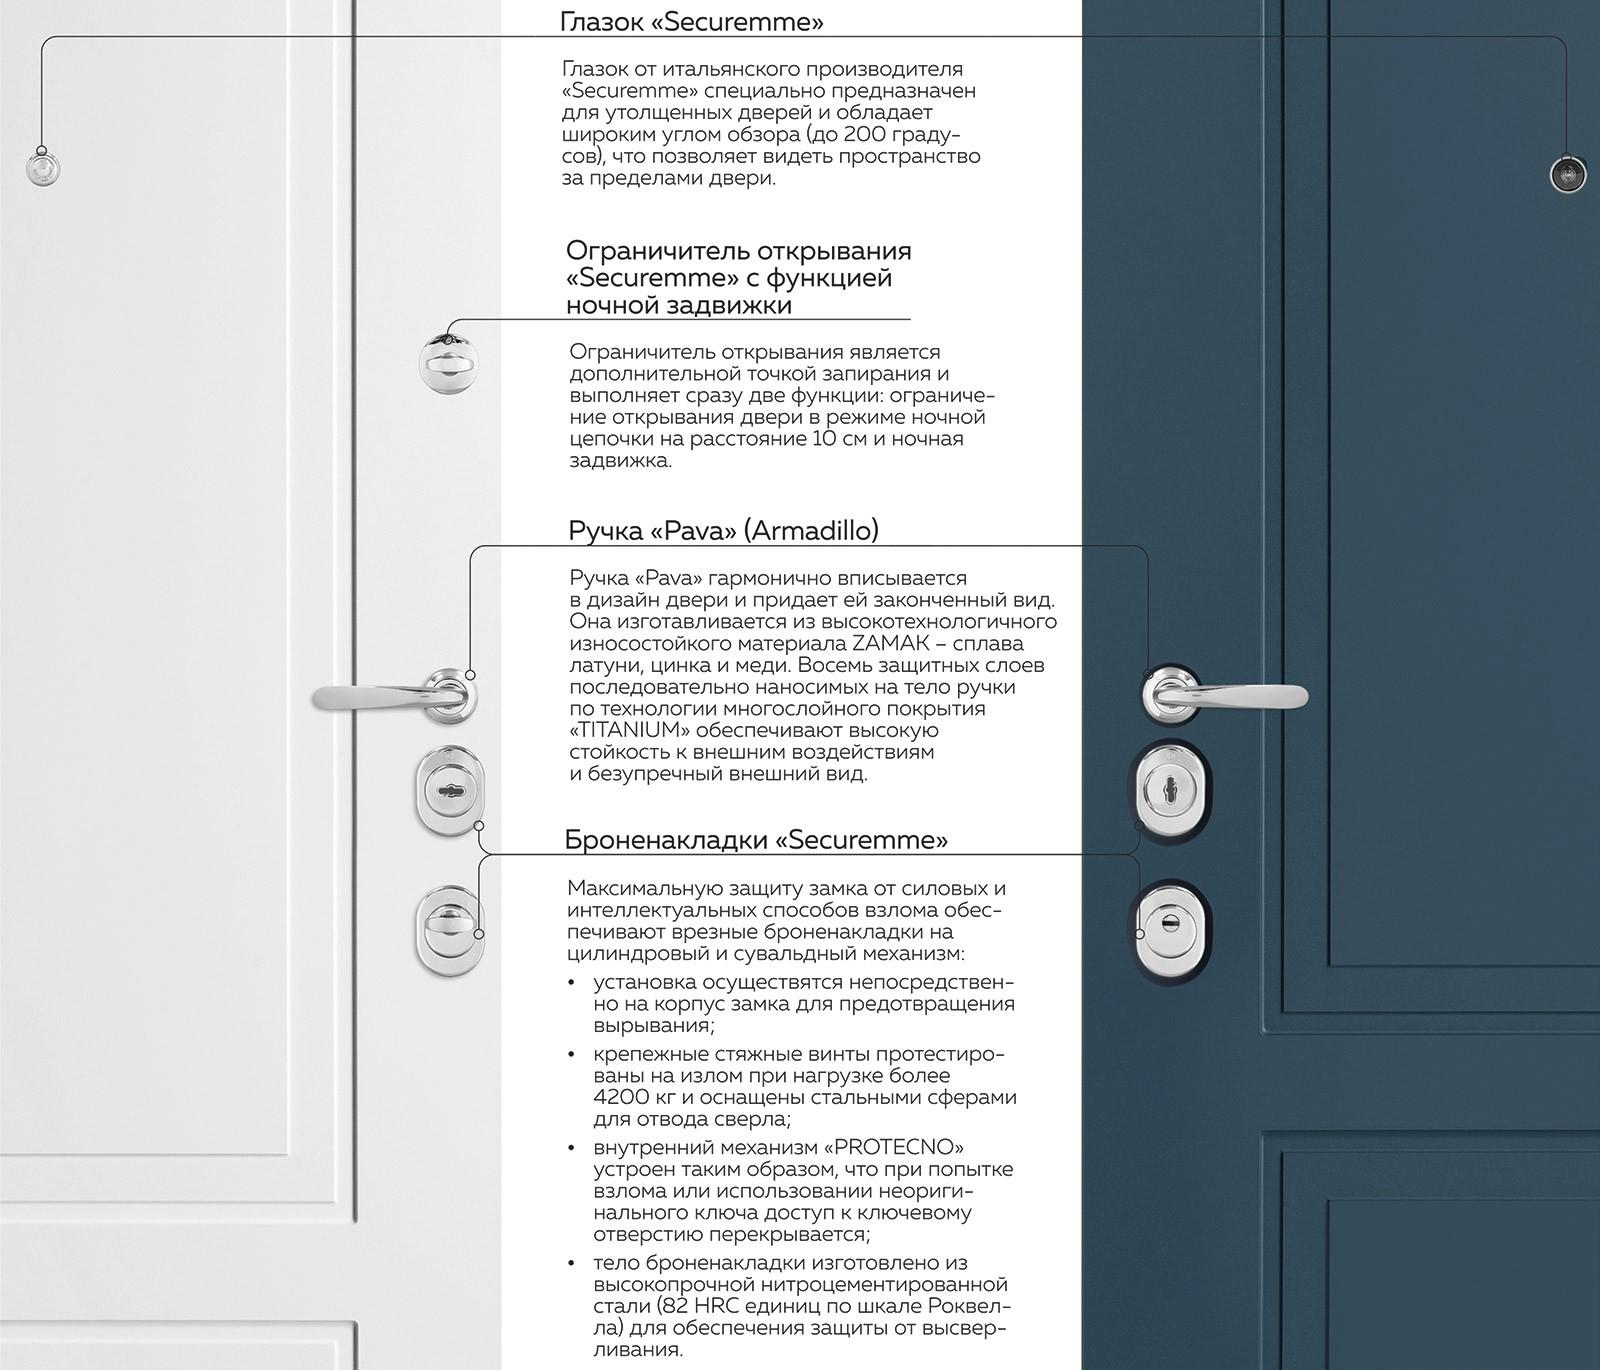 Фурнитура дверей Металюкс коллекции Милано-Классика